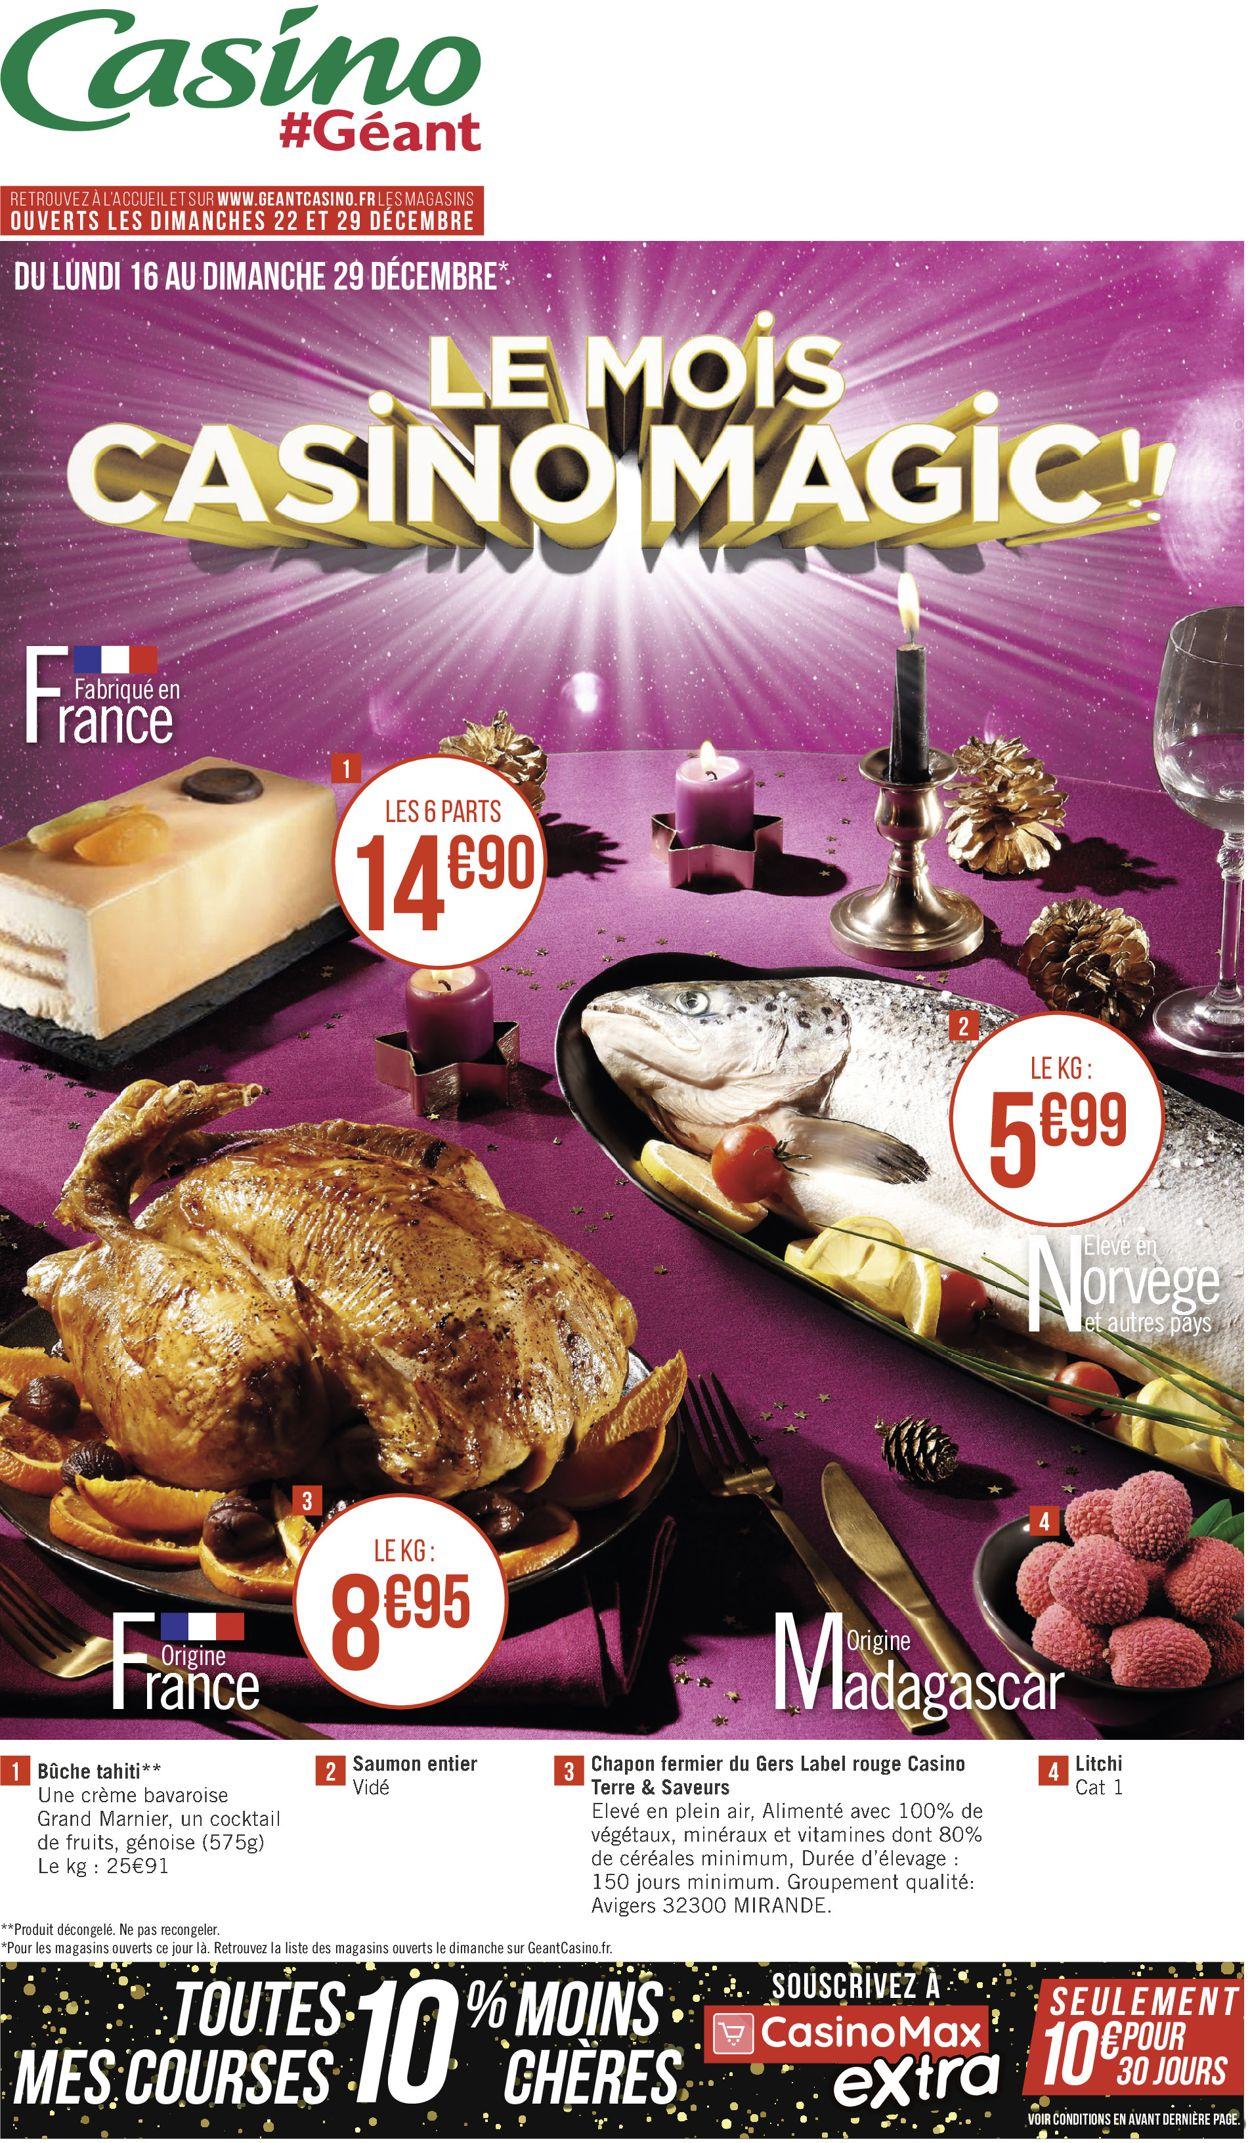 Géant Casino catalogue de Noël 2019 Catalogue - 16.12-29.12.2019